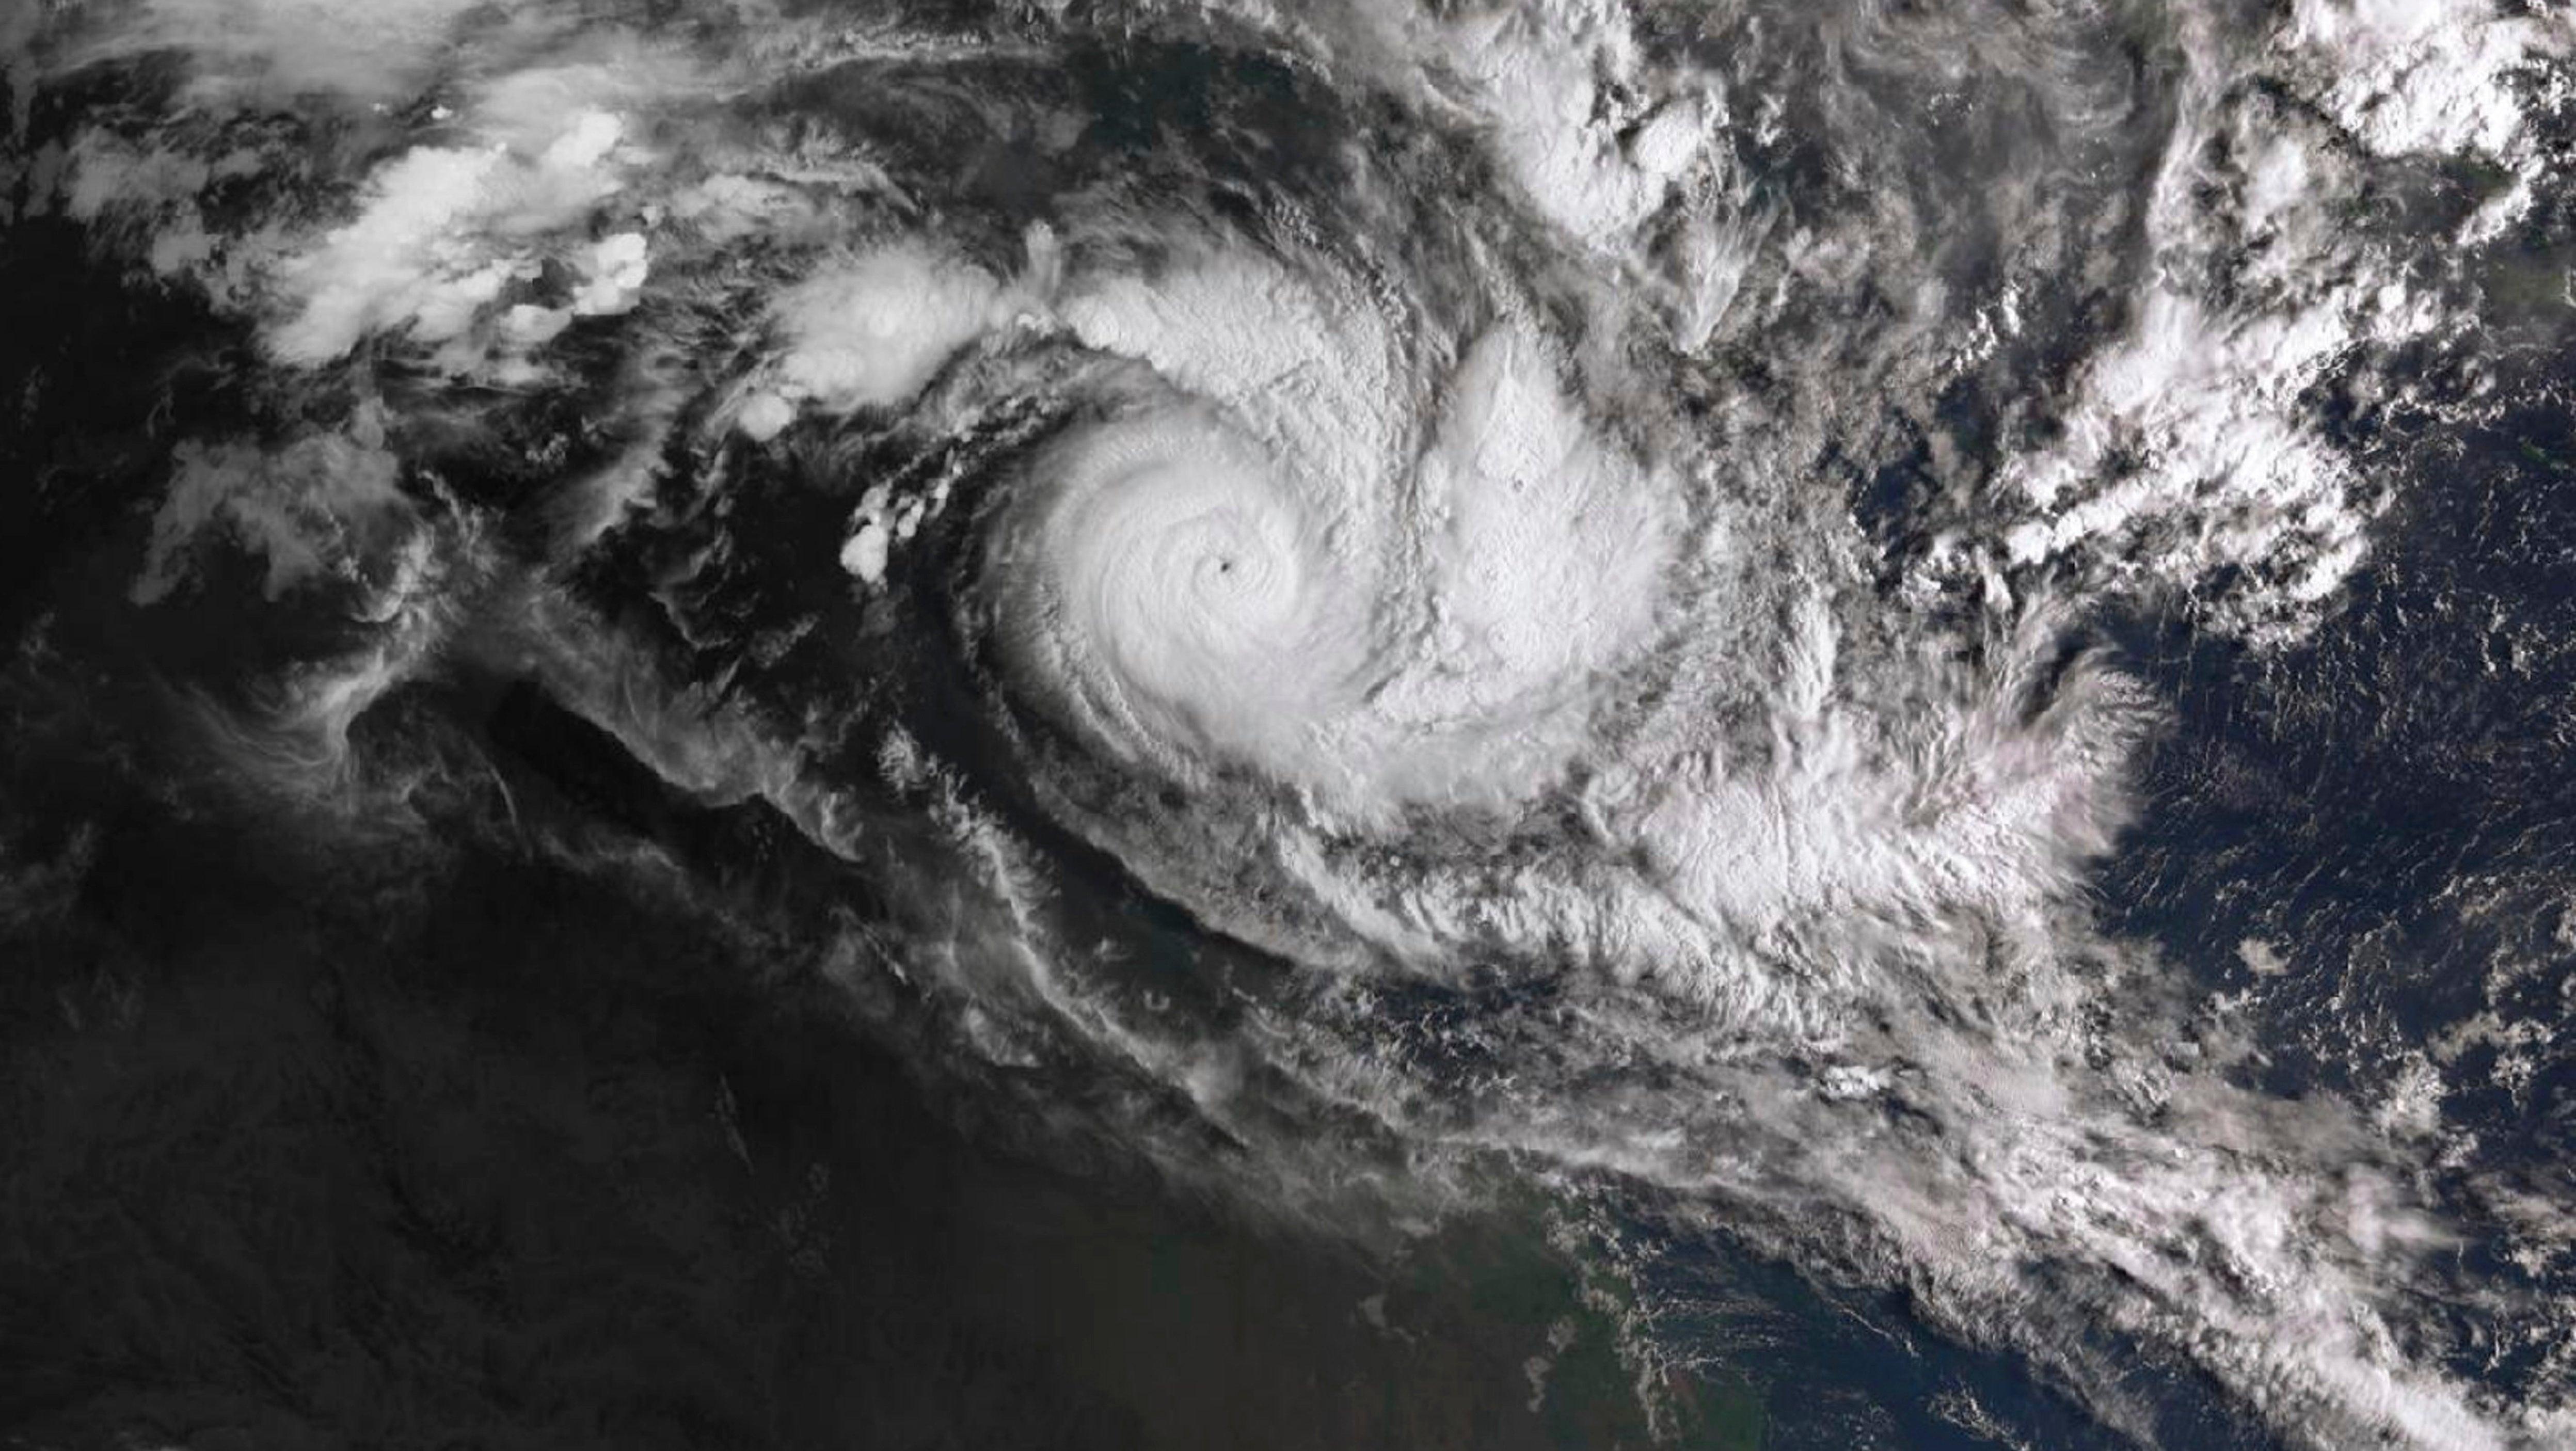 cyclone-trevor cyclone-veronica cyclones earther tropical-cyclones tropical-storms